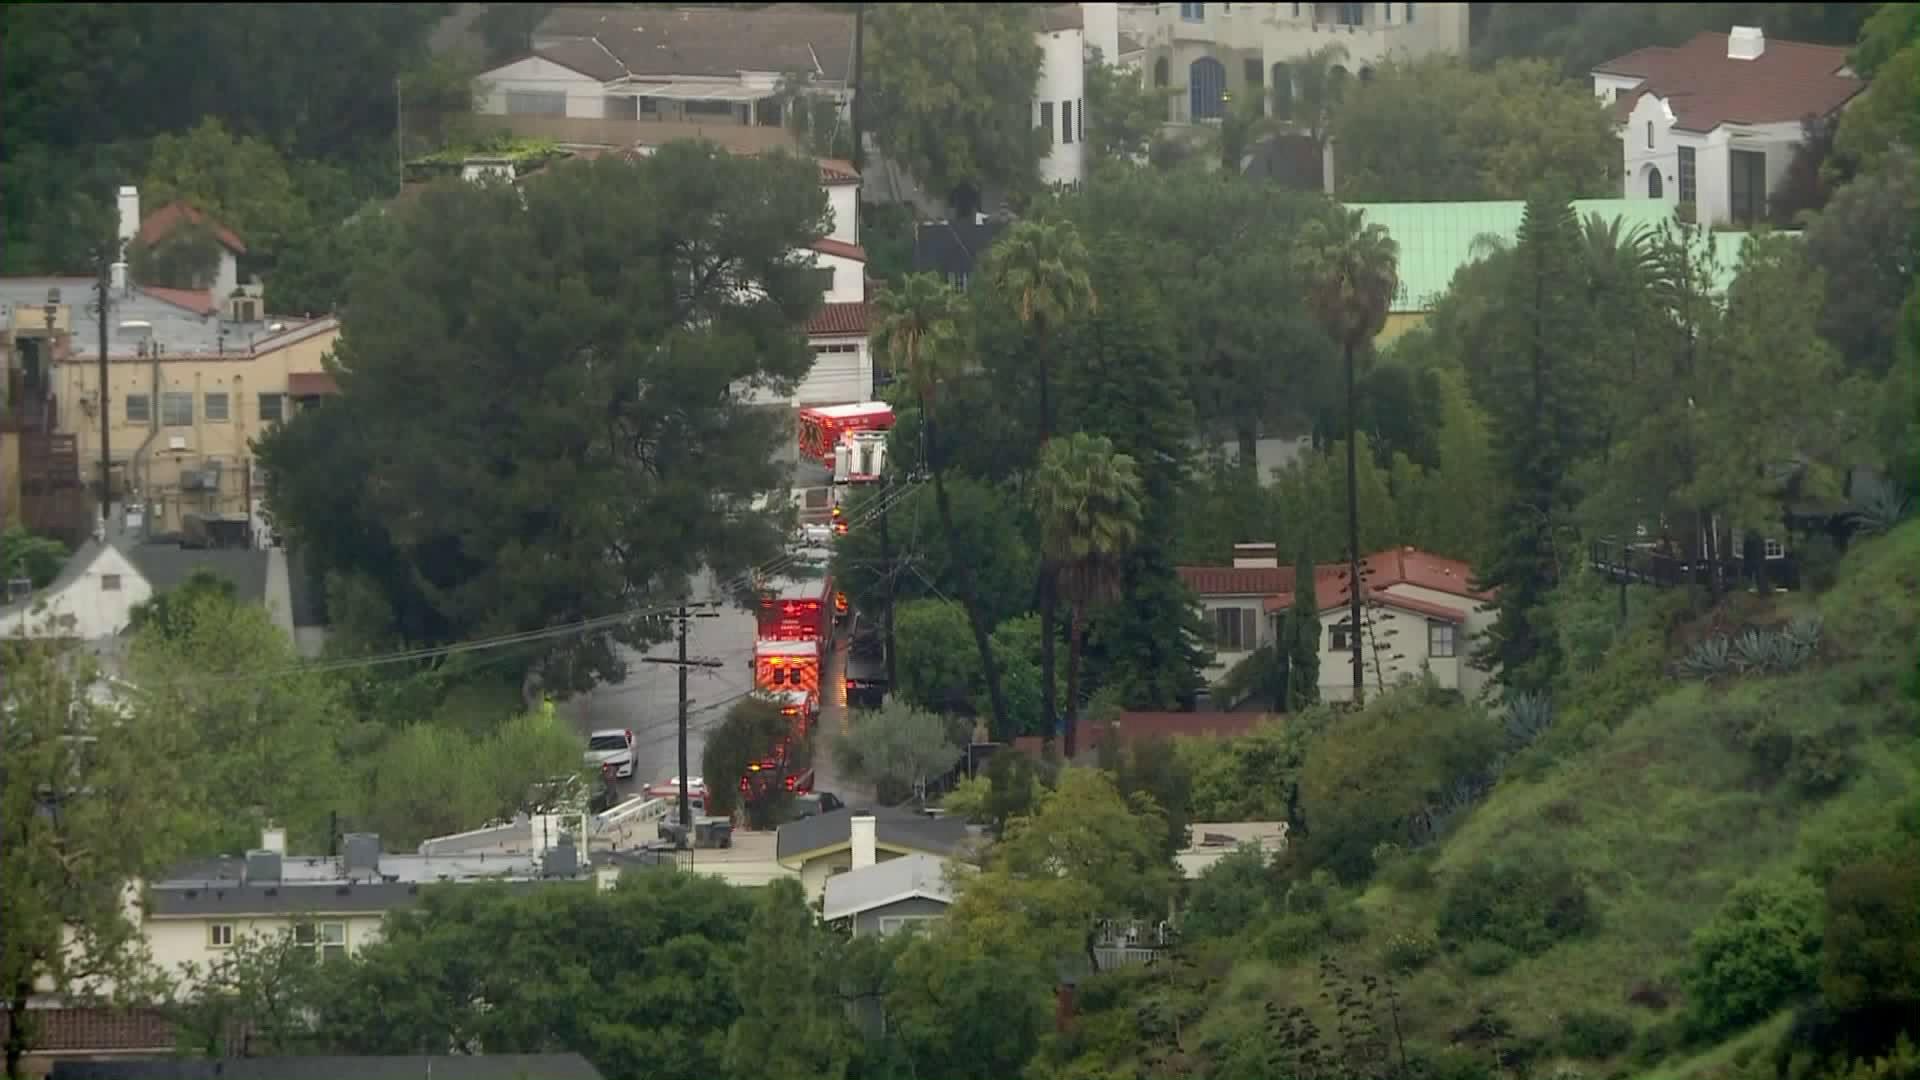 Fire crews respond to a debris flow in the Hollywood Hills on April 6, 2020. (KTLA)